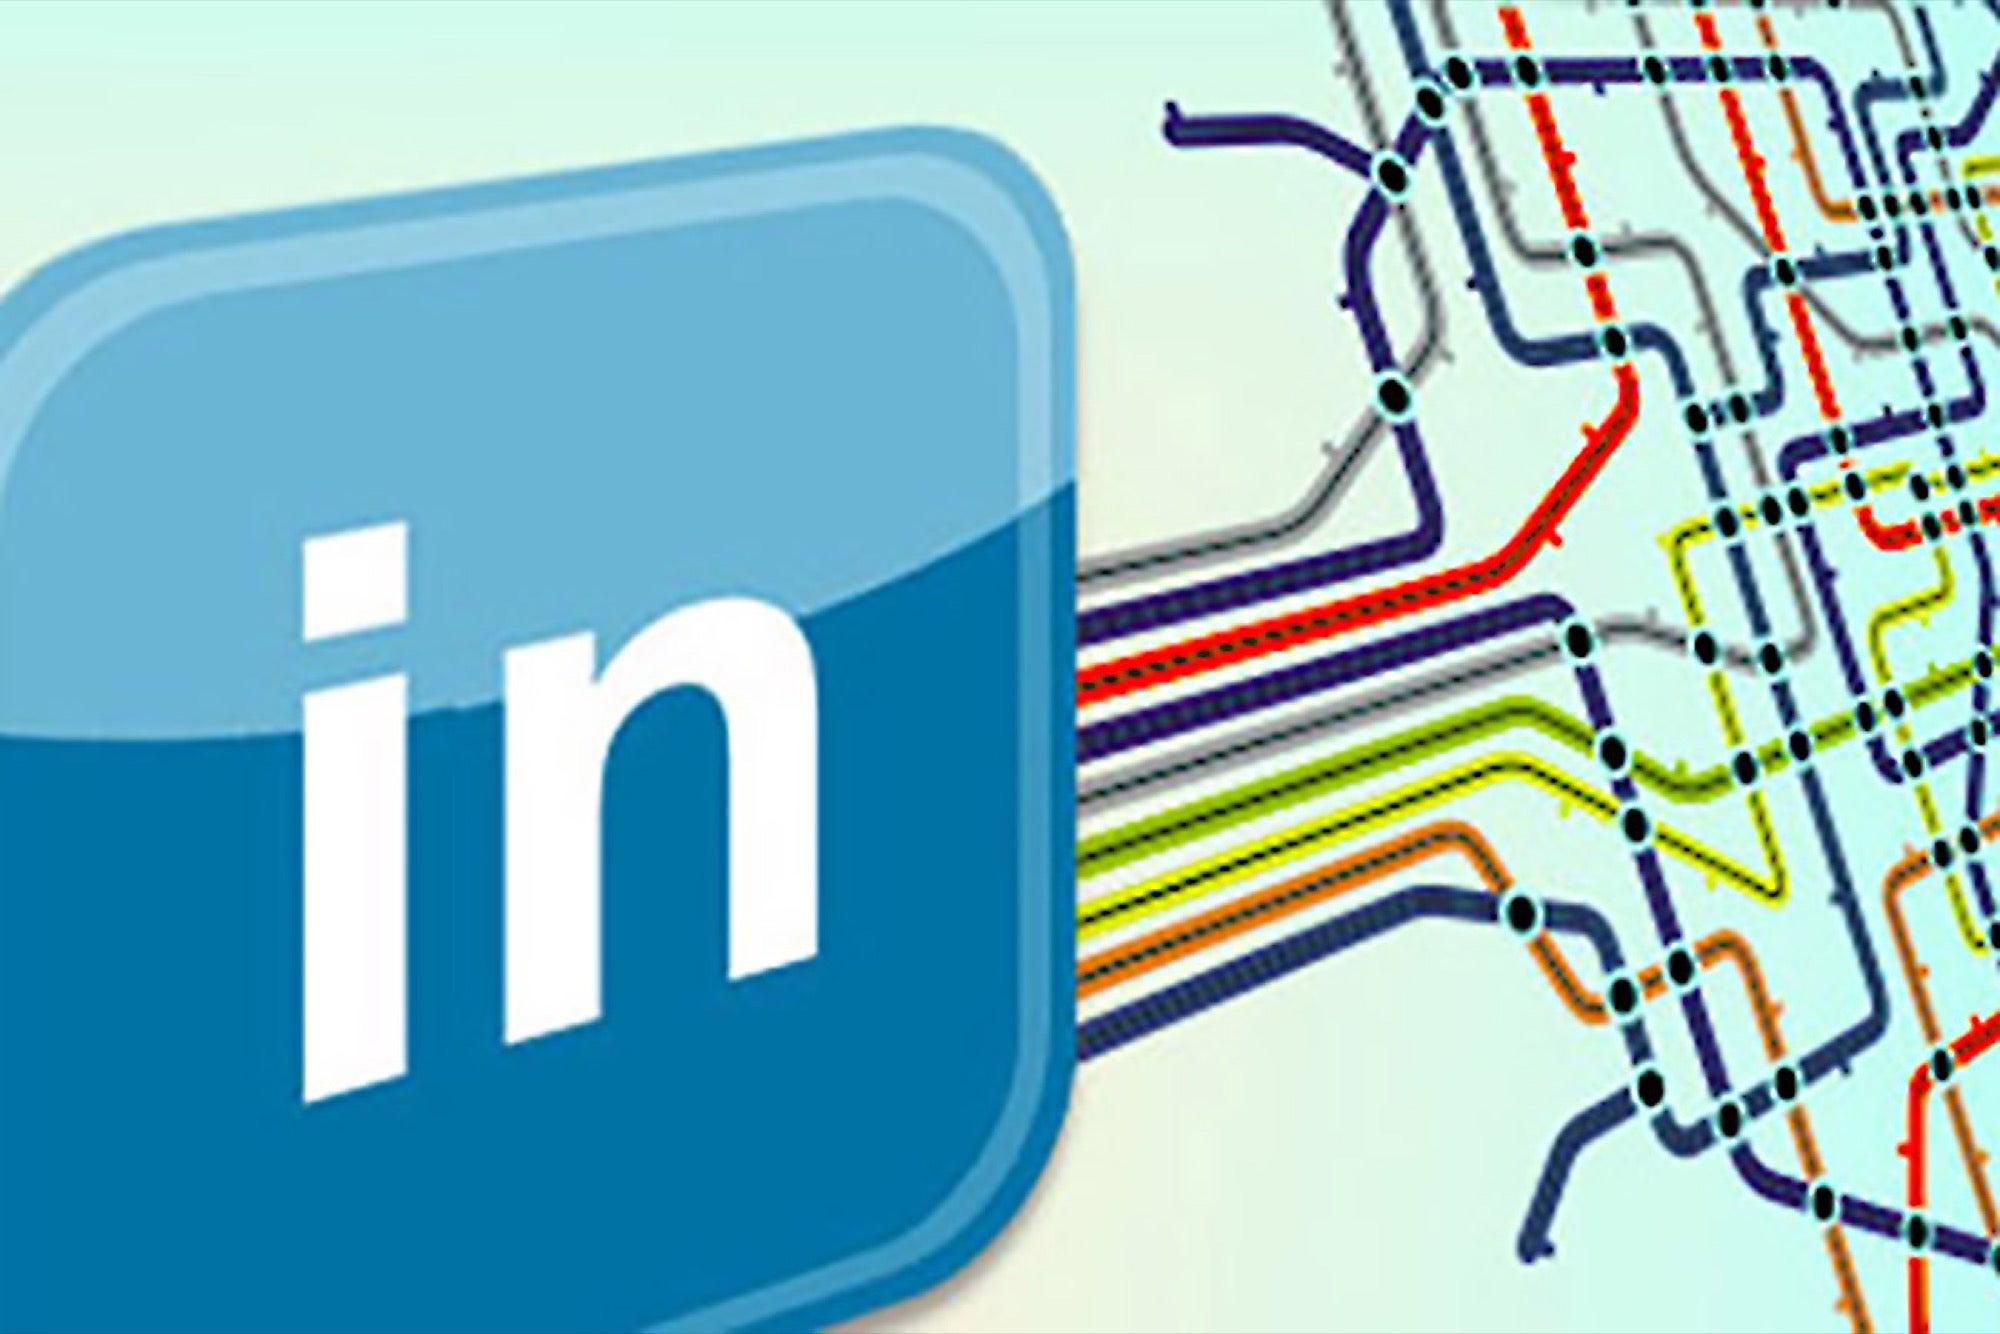 Building Your LinkedIn Network